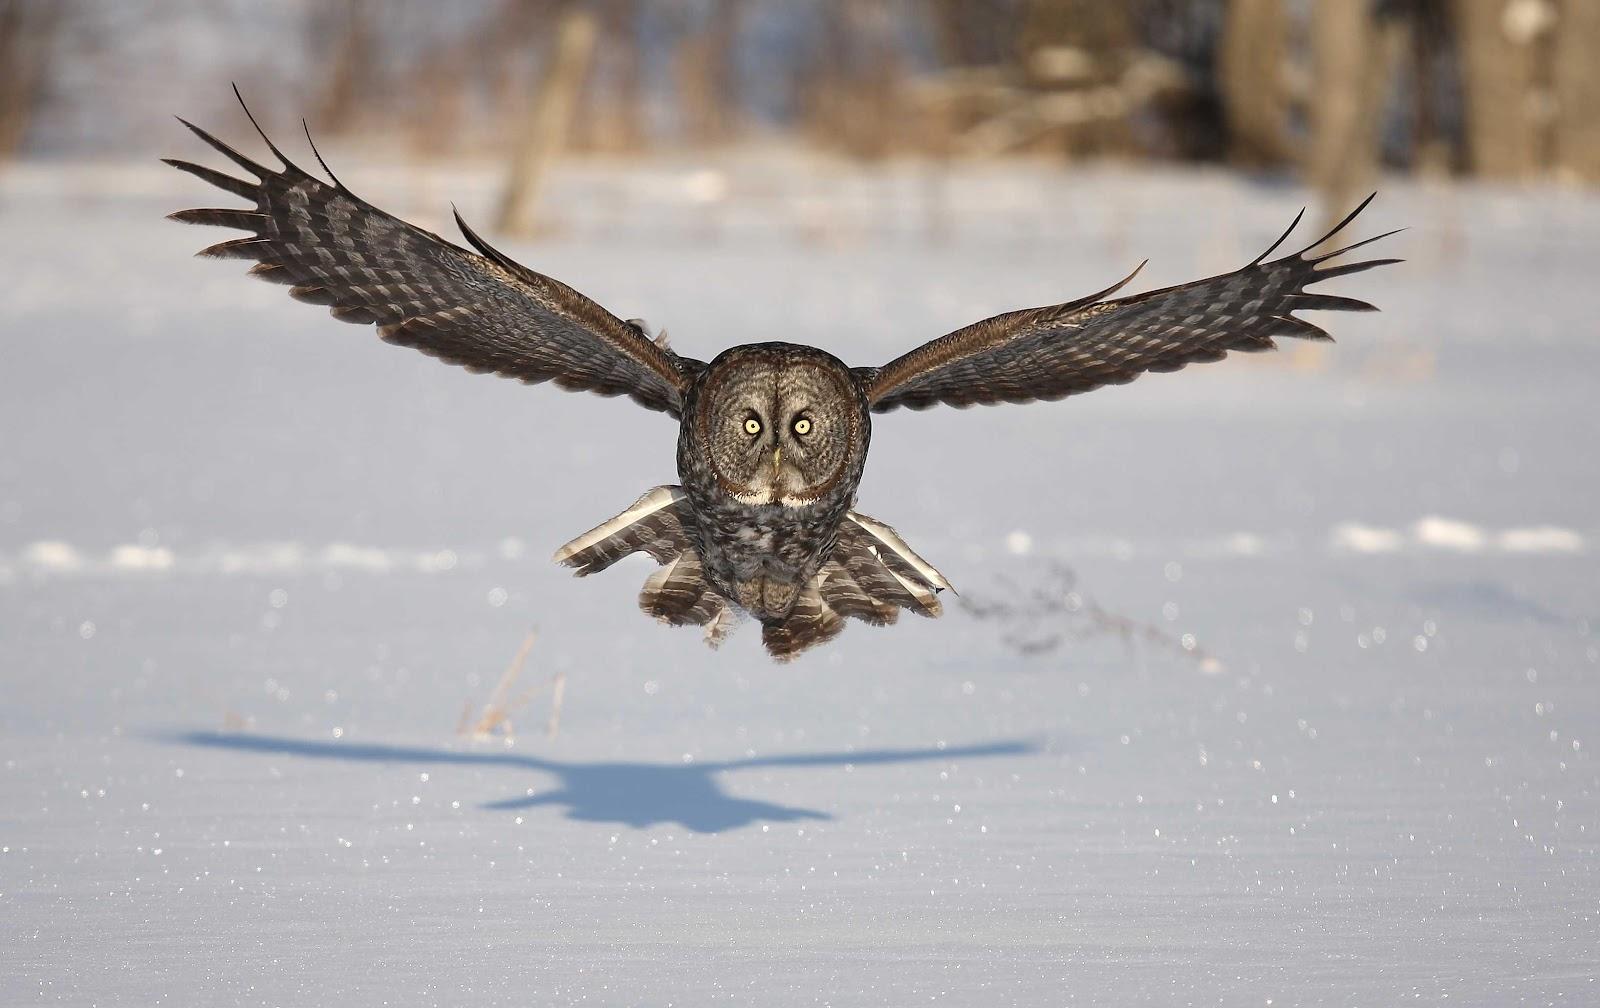 GREAT GRAY OWL | XAMOBOX.BLOGSPOT.COM, RELAX